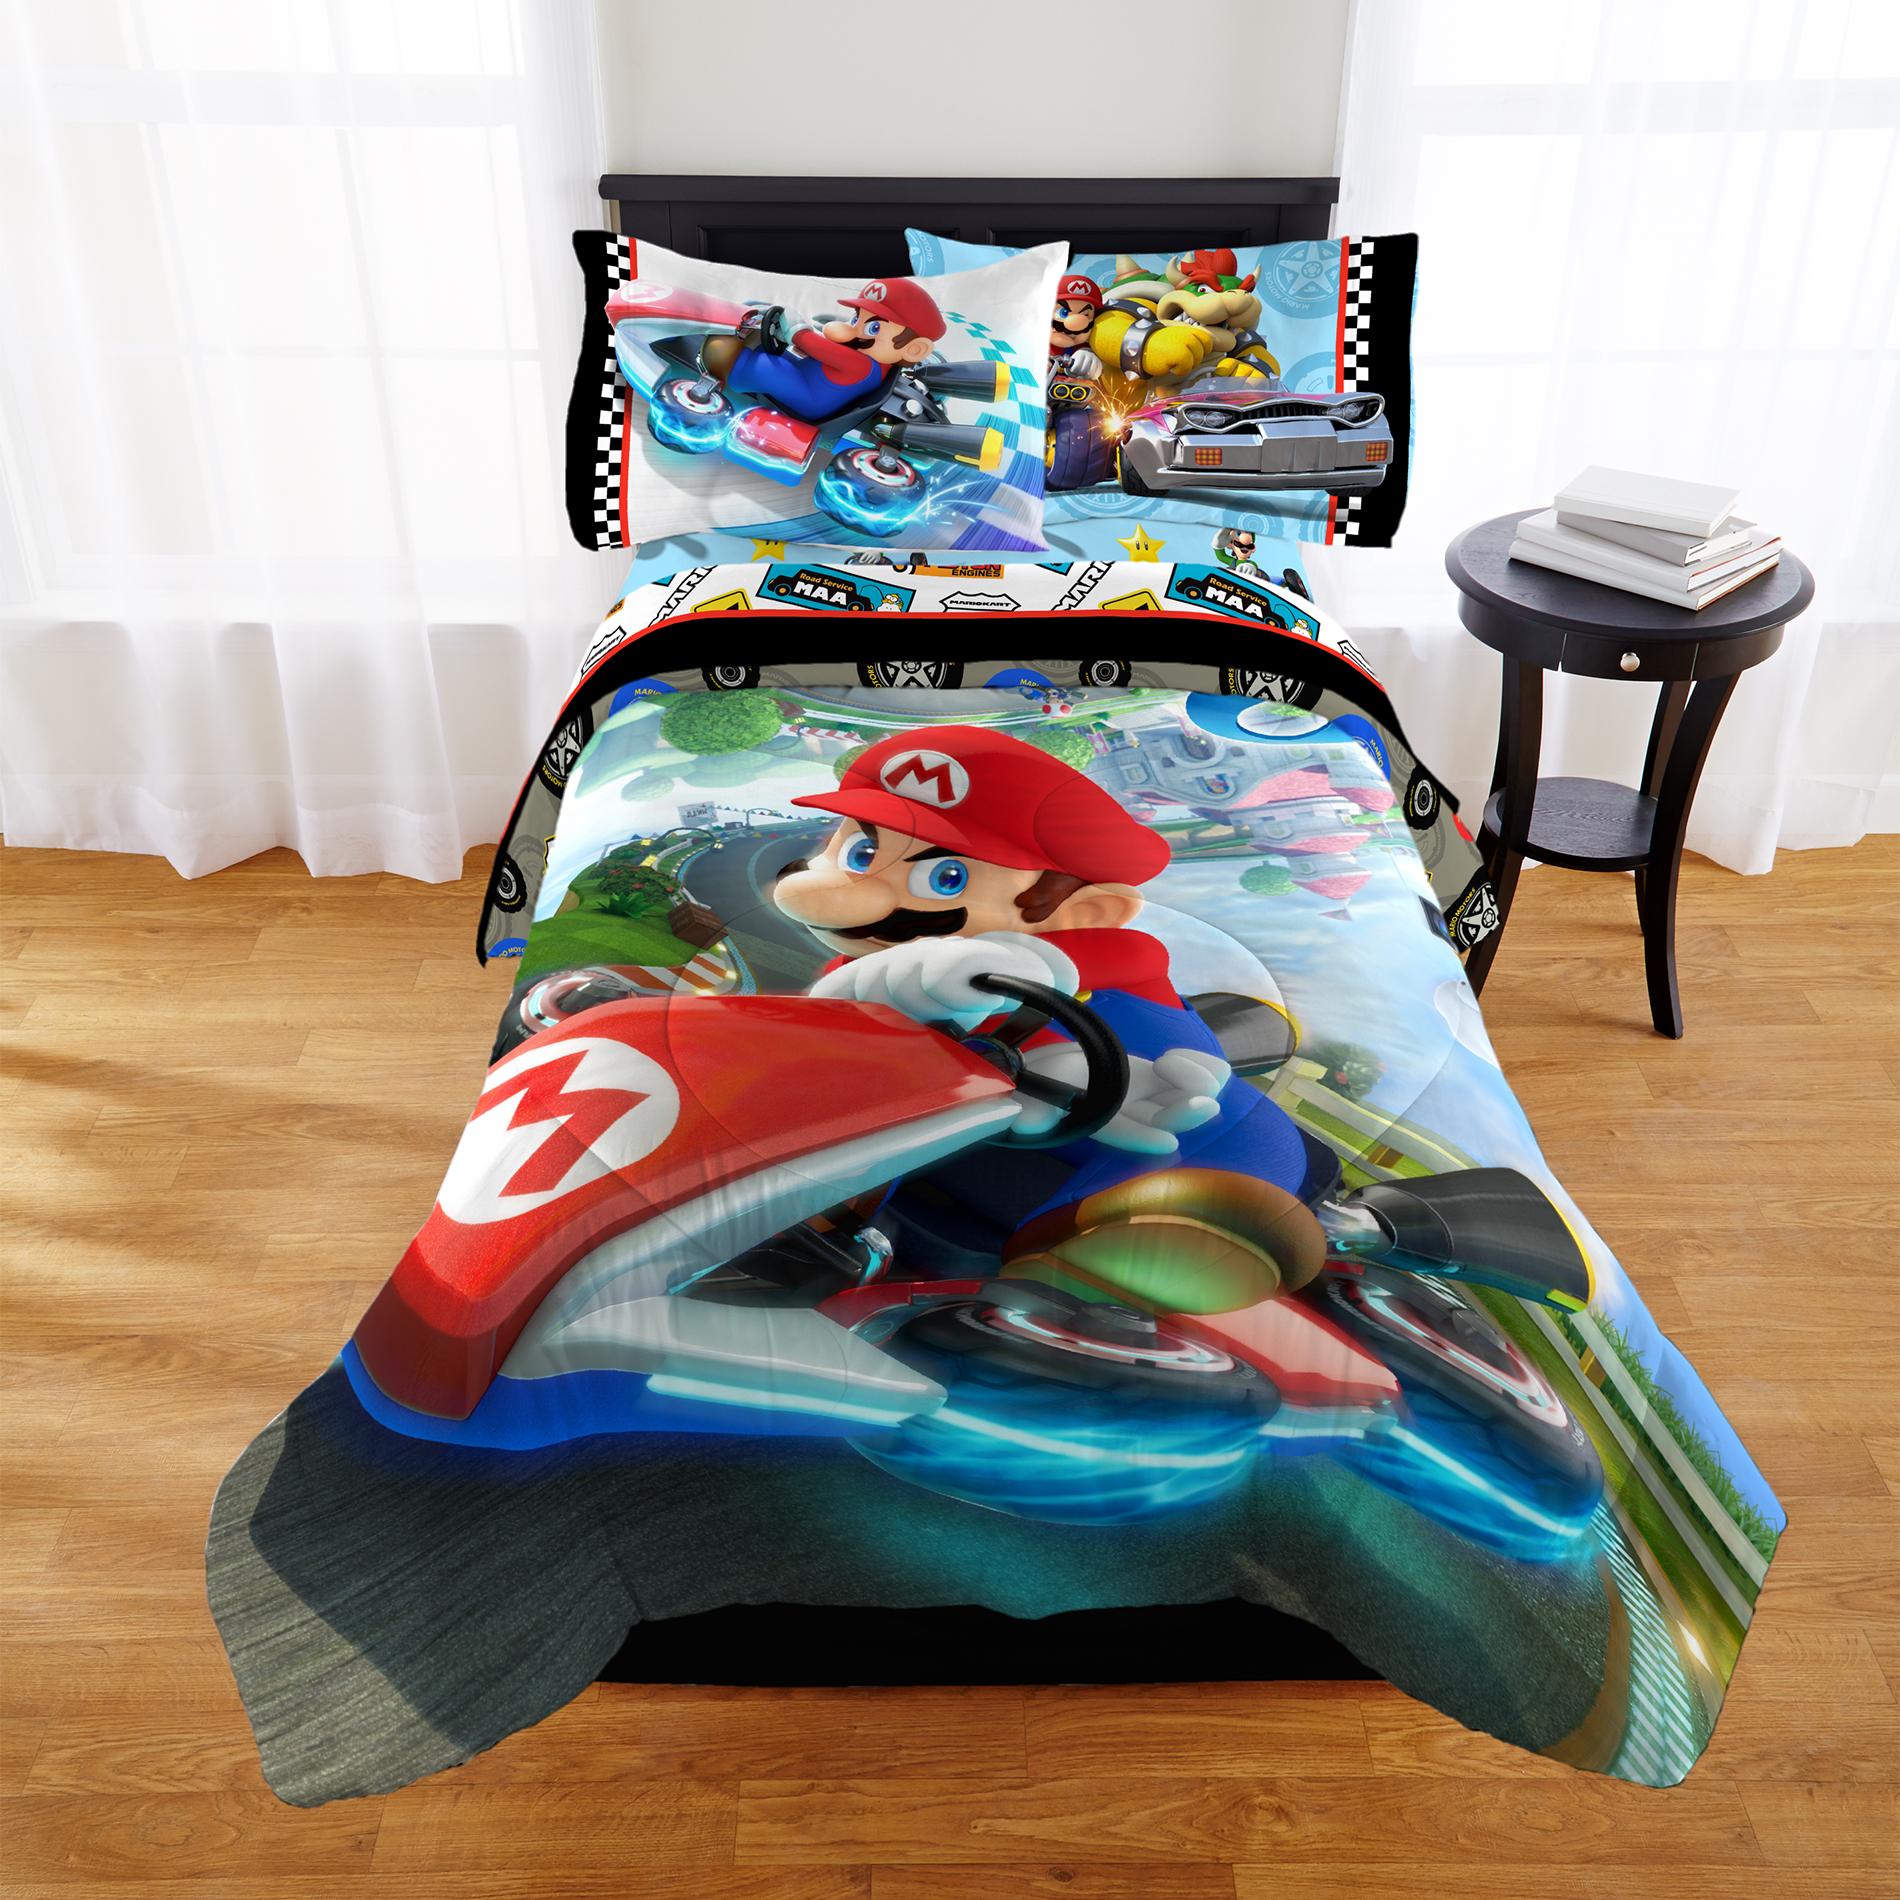 Nintendo Super Mario Road Rumble 72